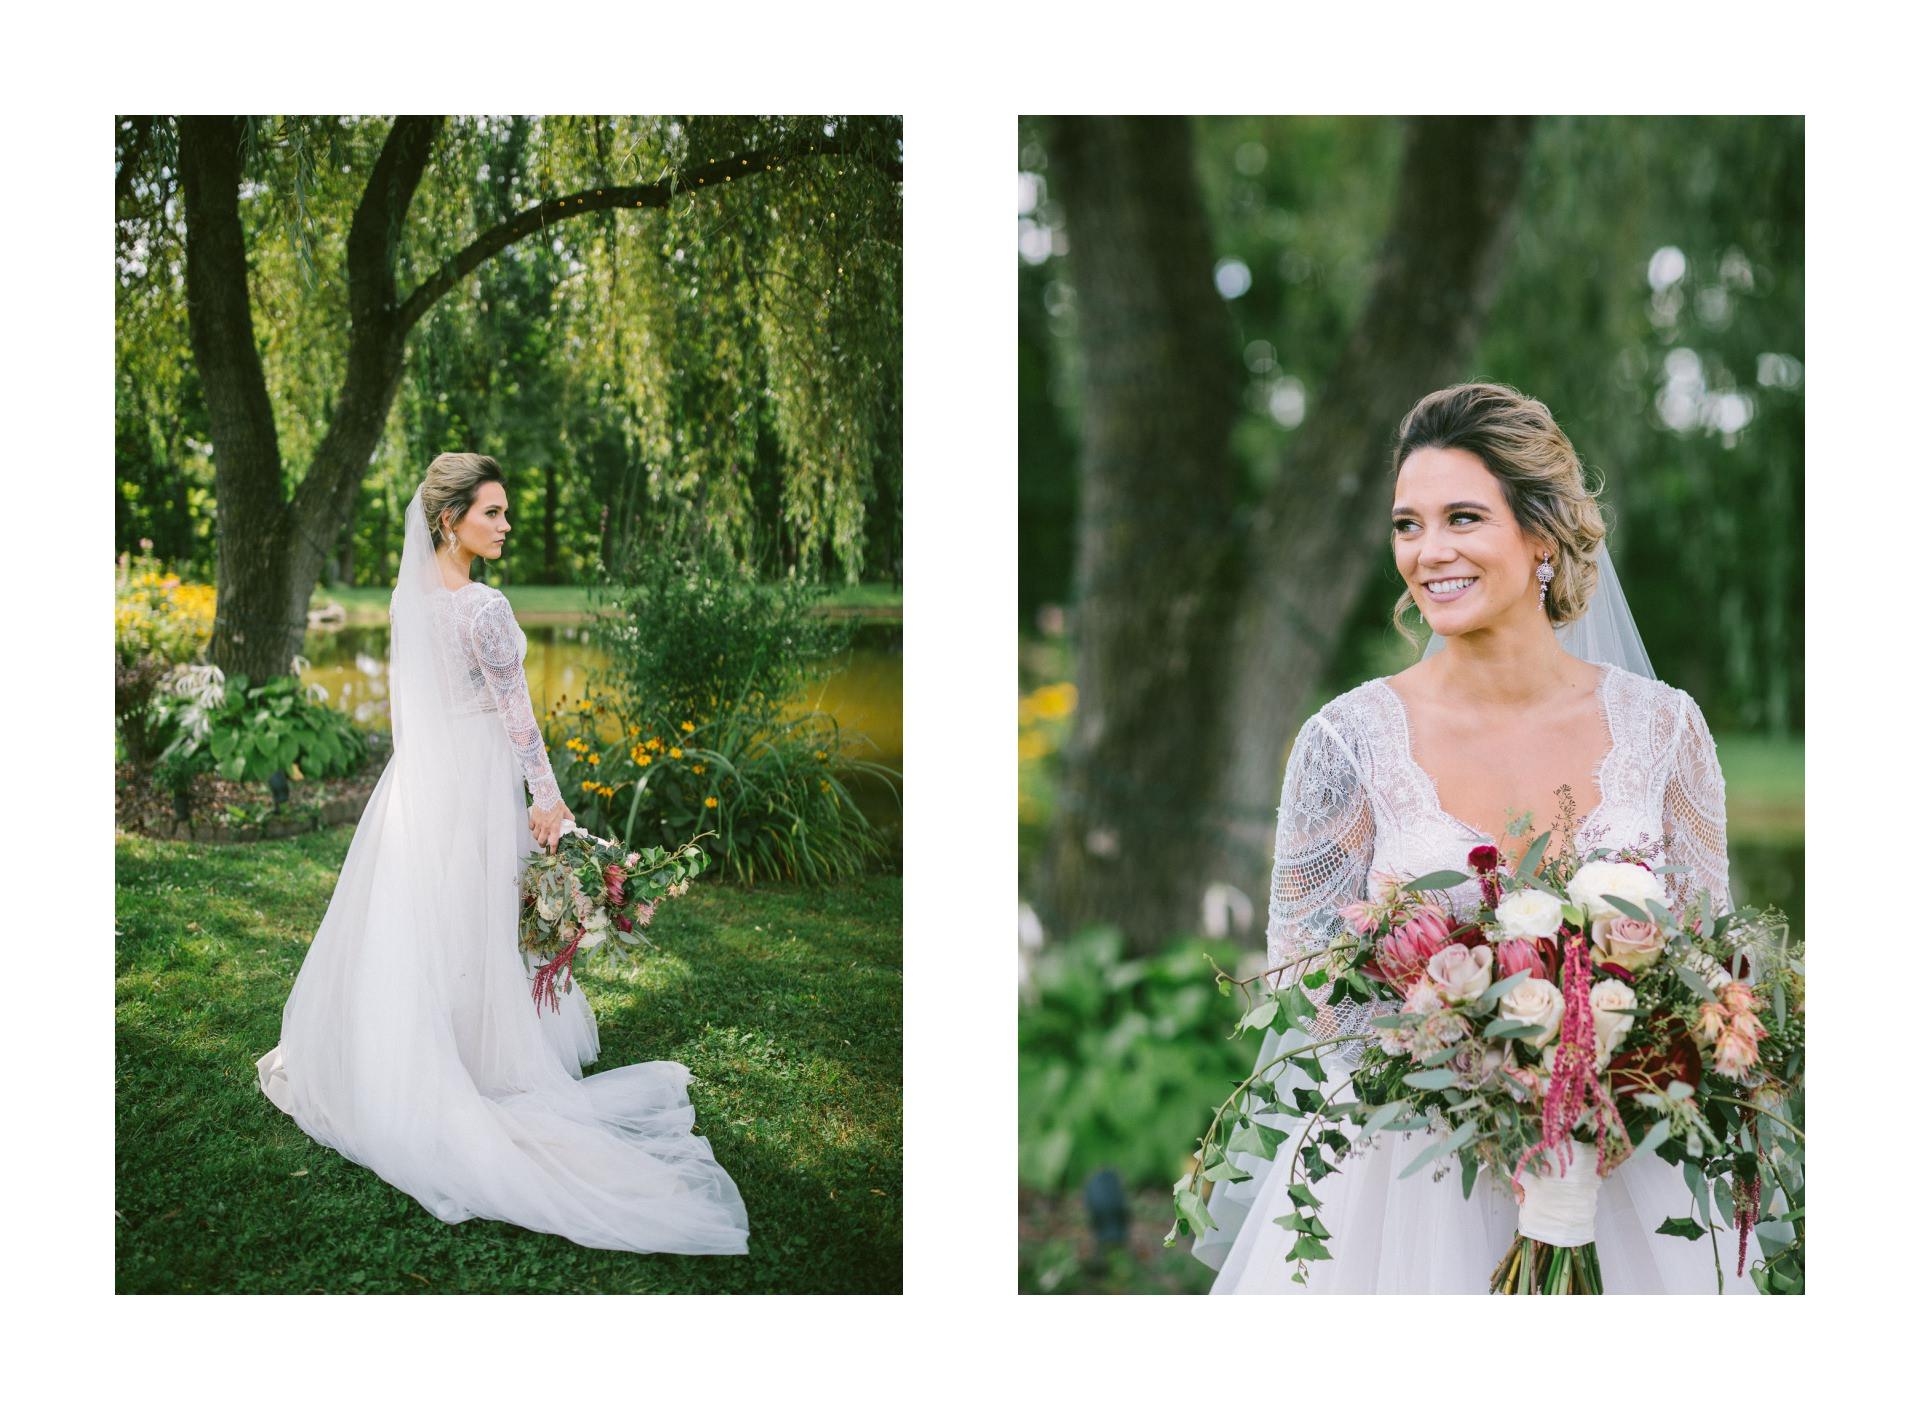 Meadow Ridge Farm Wedding Photos in Windsor 2 6.jpg